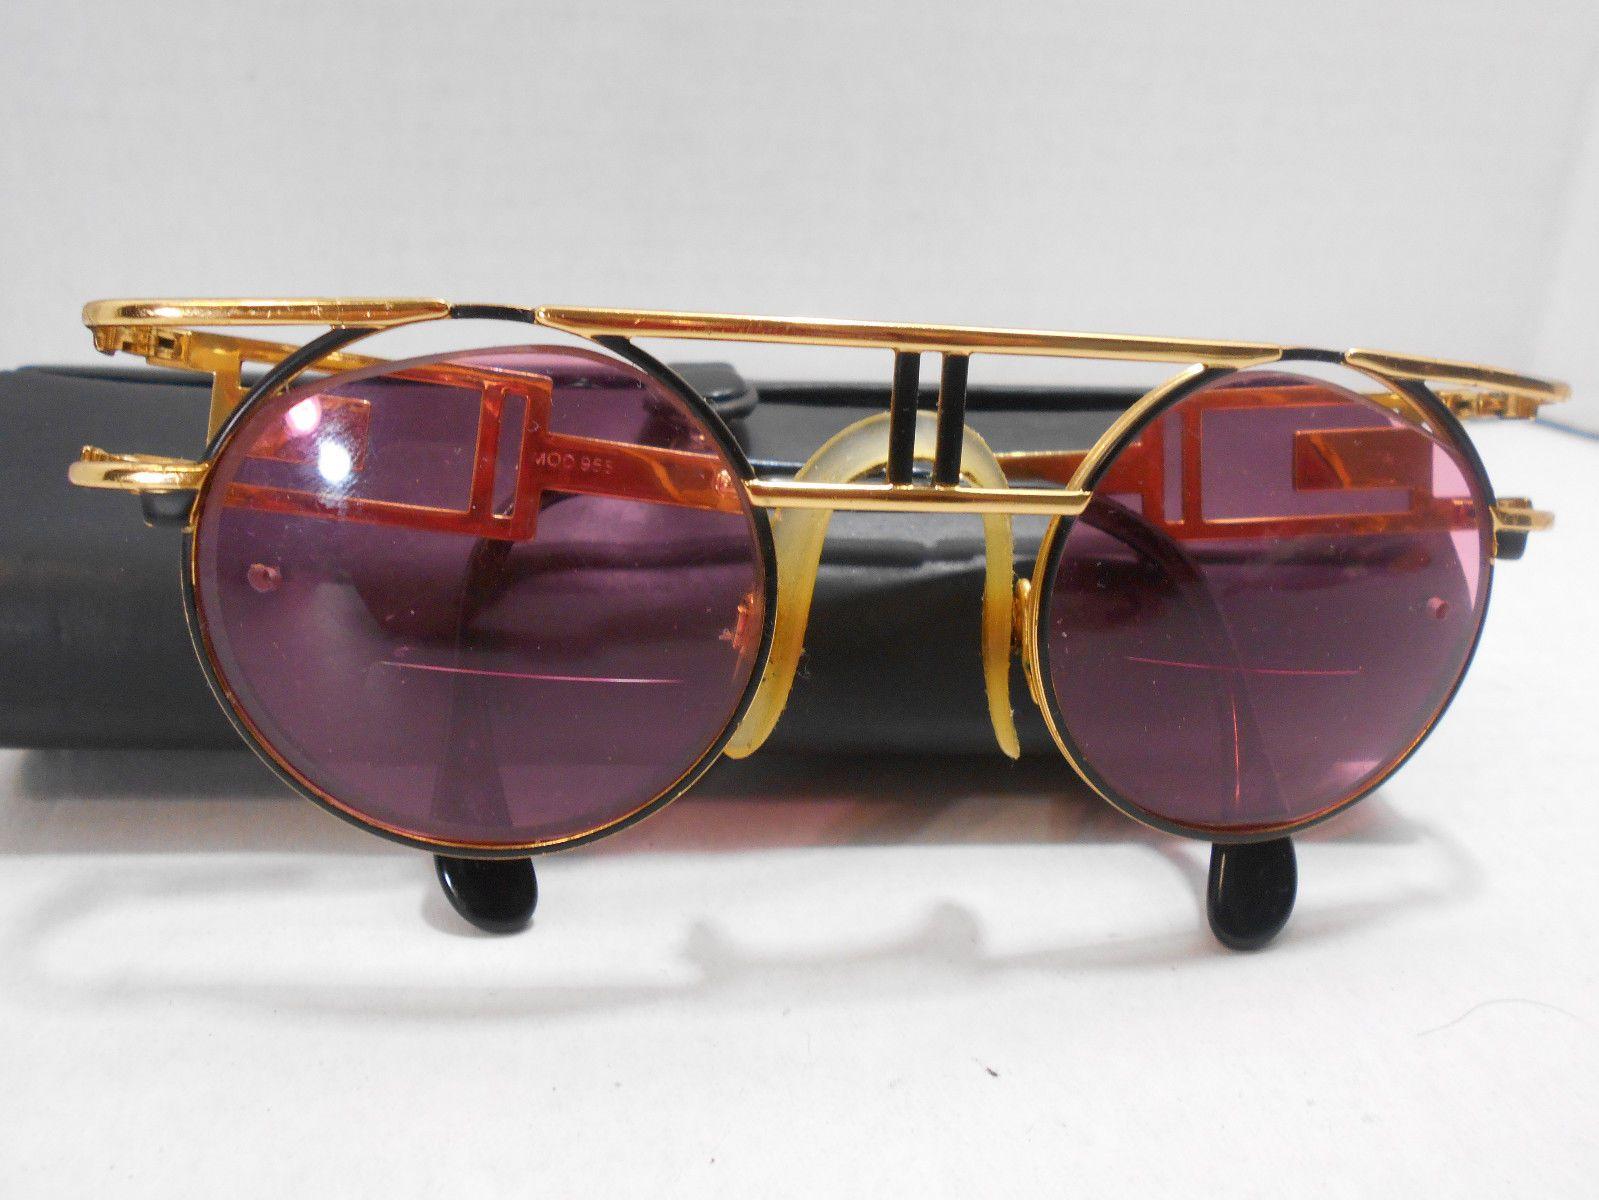 f010c6ebd3 Cazal Vintage Mod 958 Col 302